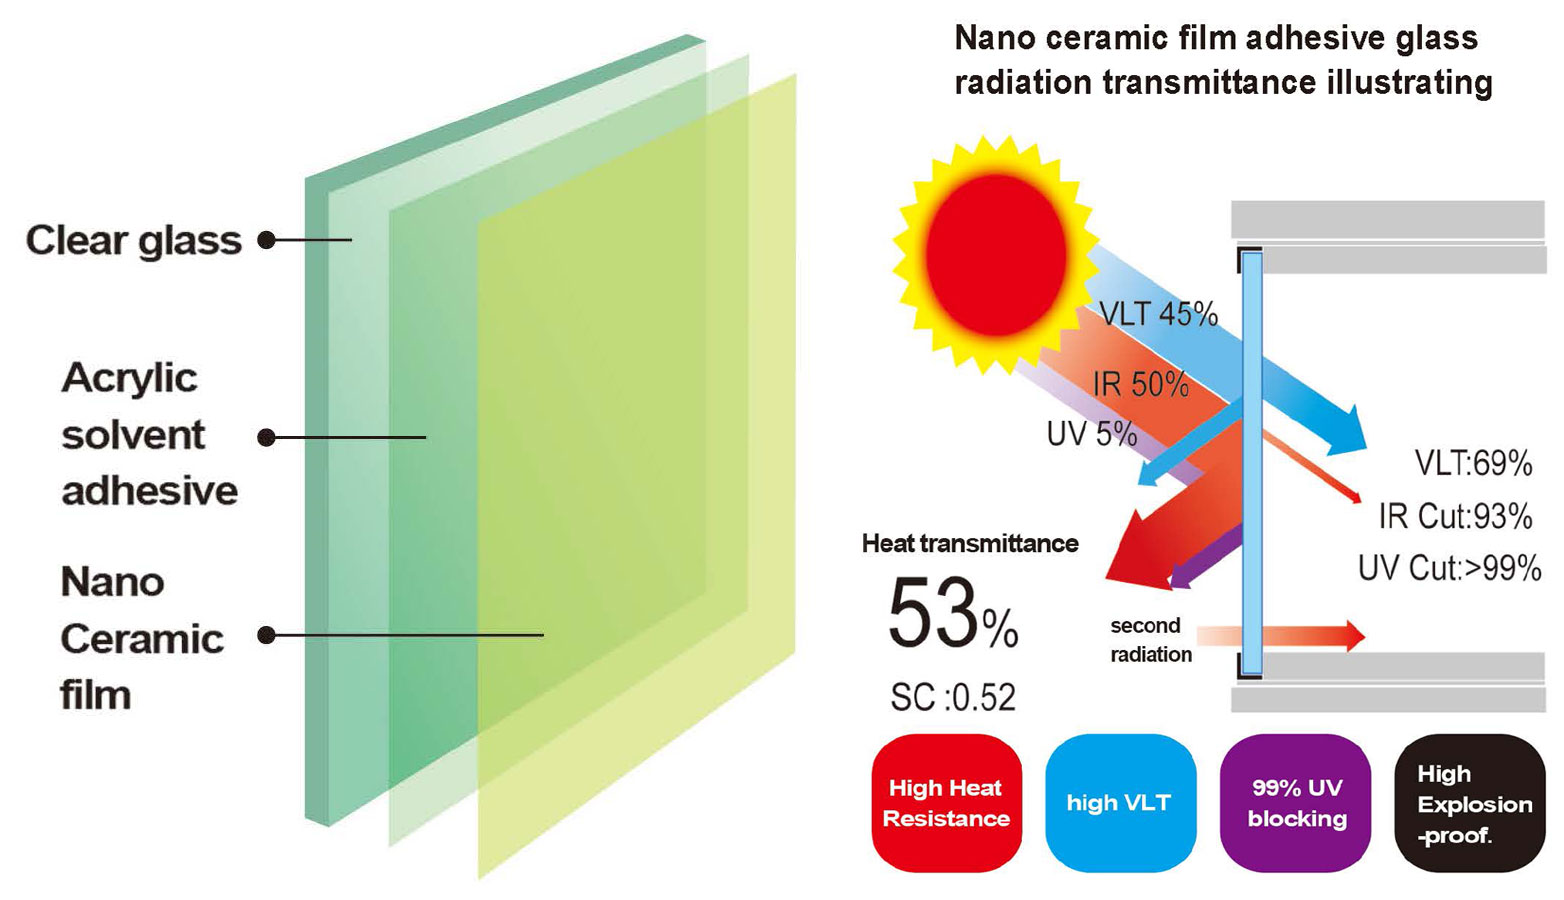 Nano Ceramic film adhesive glass